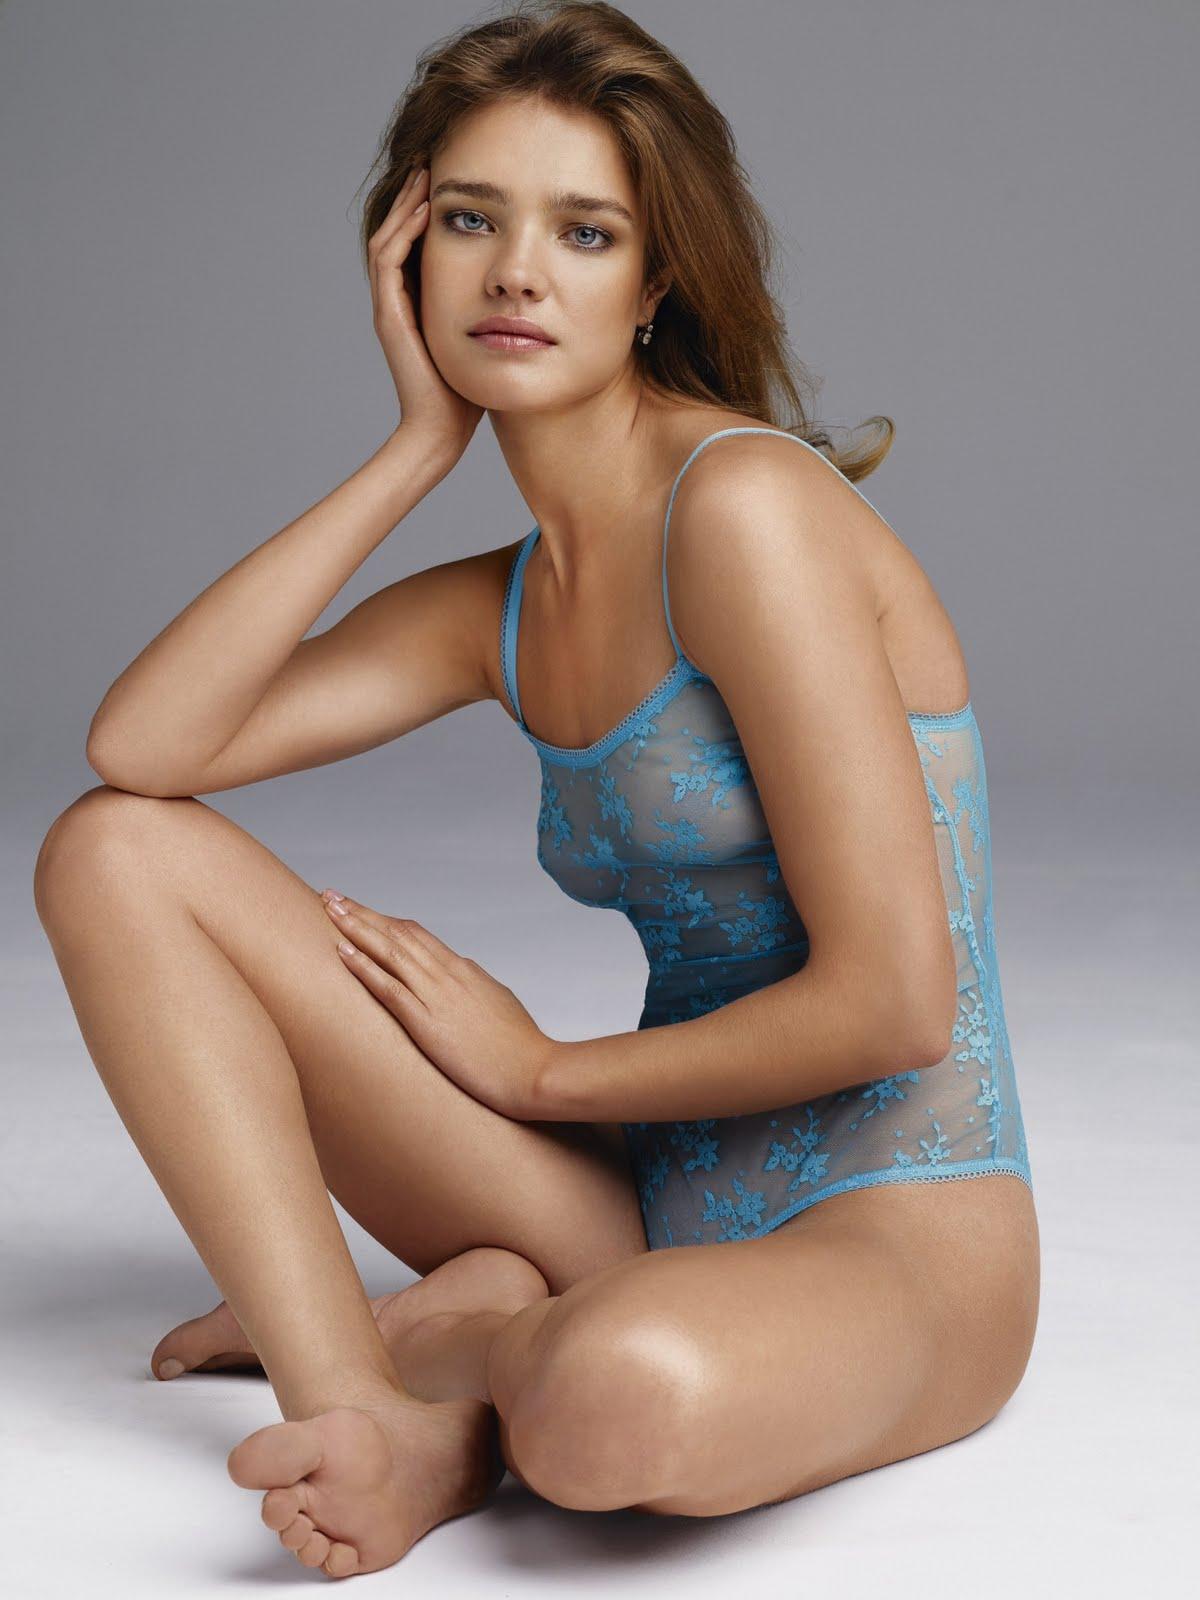 Cleavage Natalia Vodianova nude photos 2019